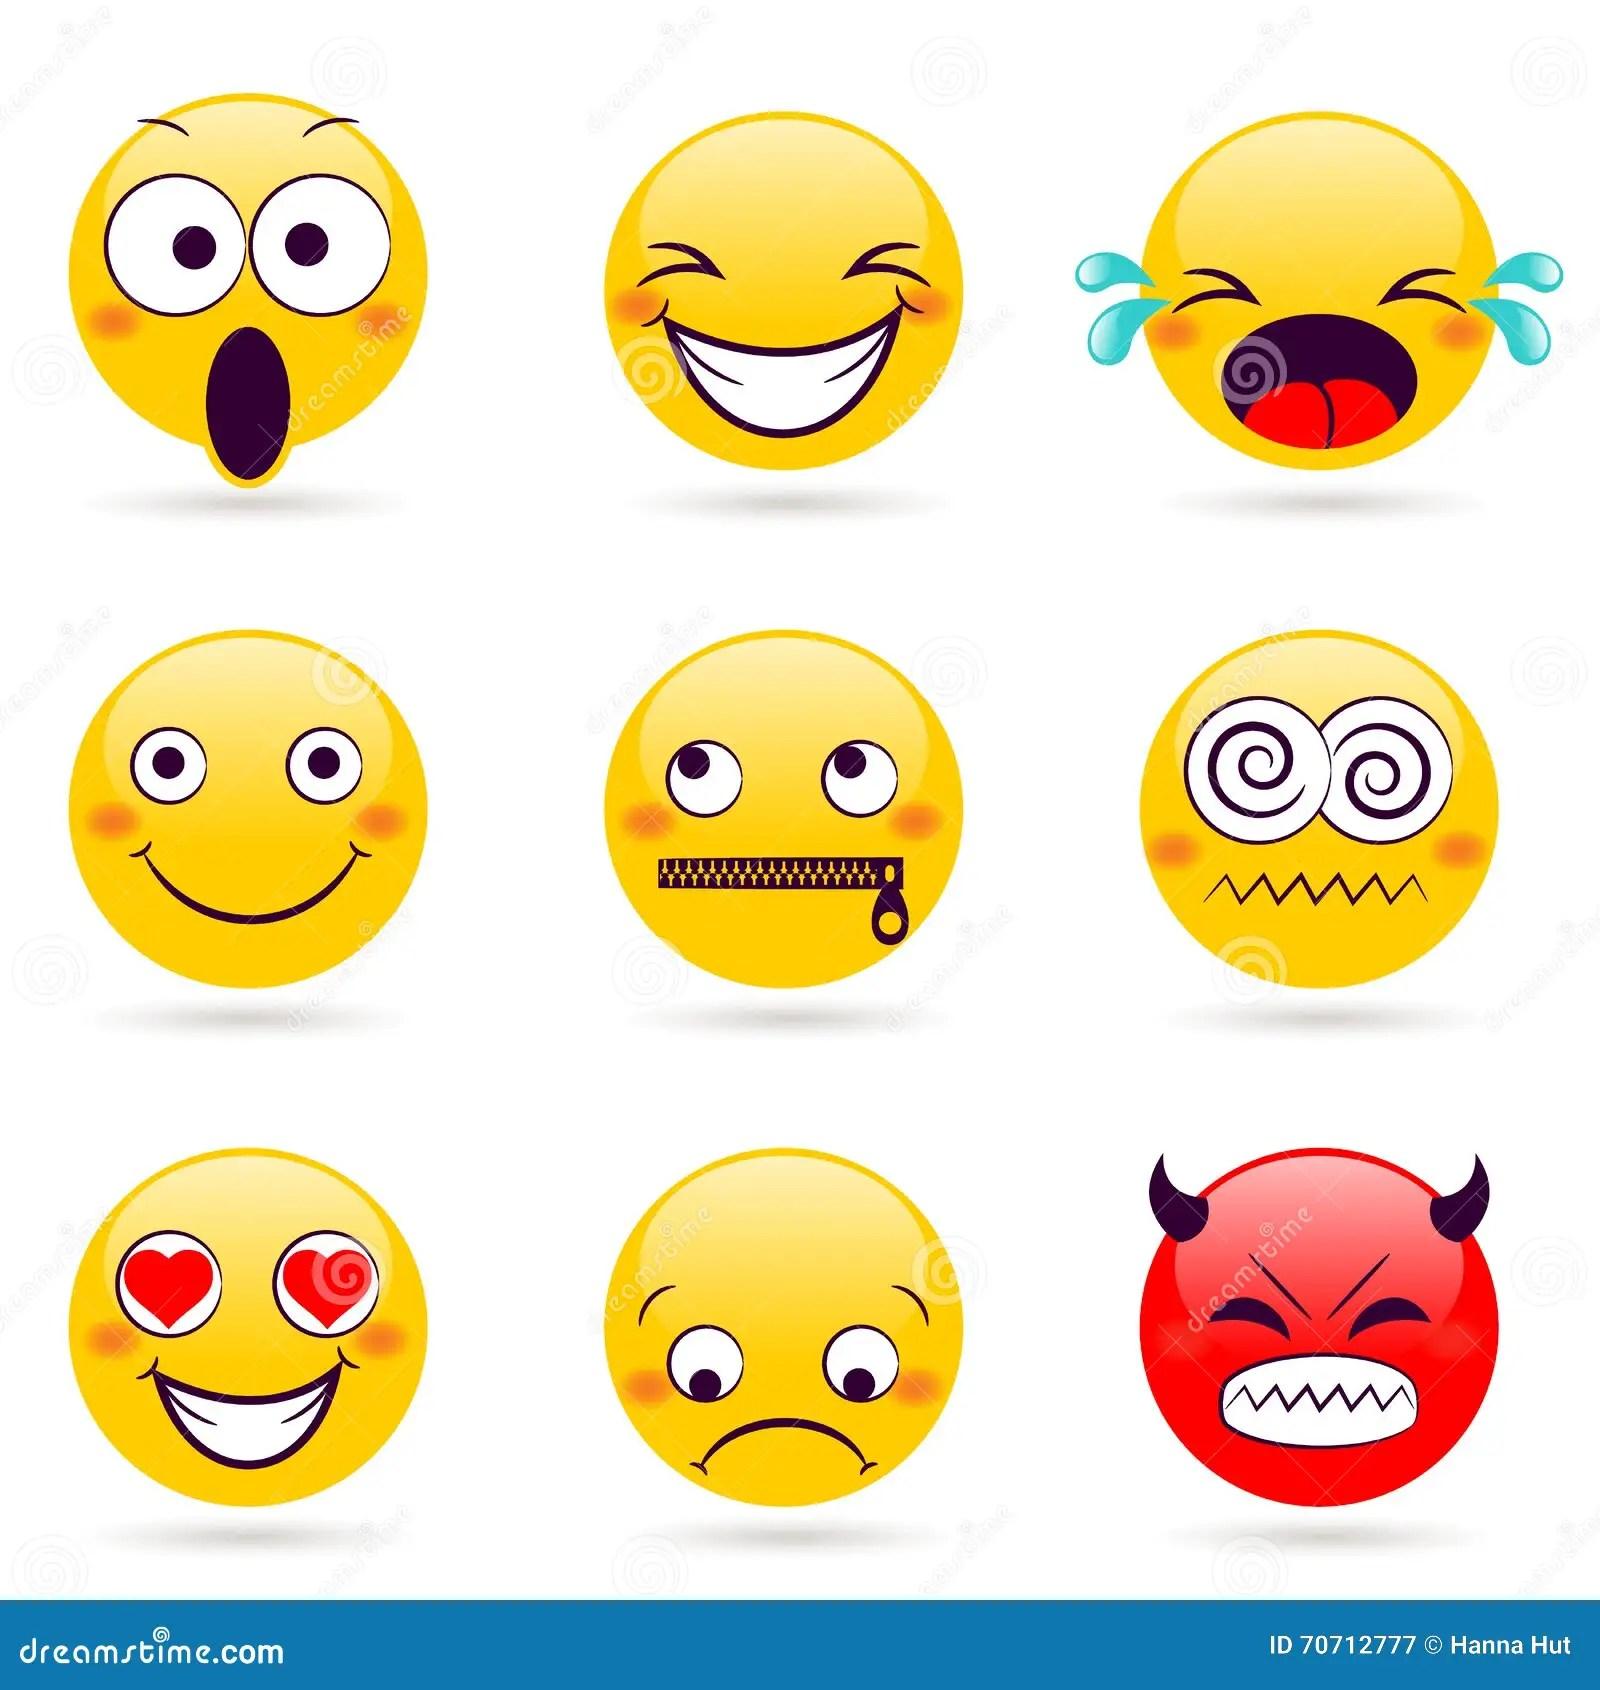 Leendesymbol Smileyframsidor Som Uttrycker Olika Kanslor